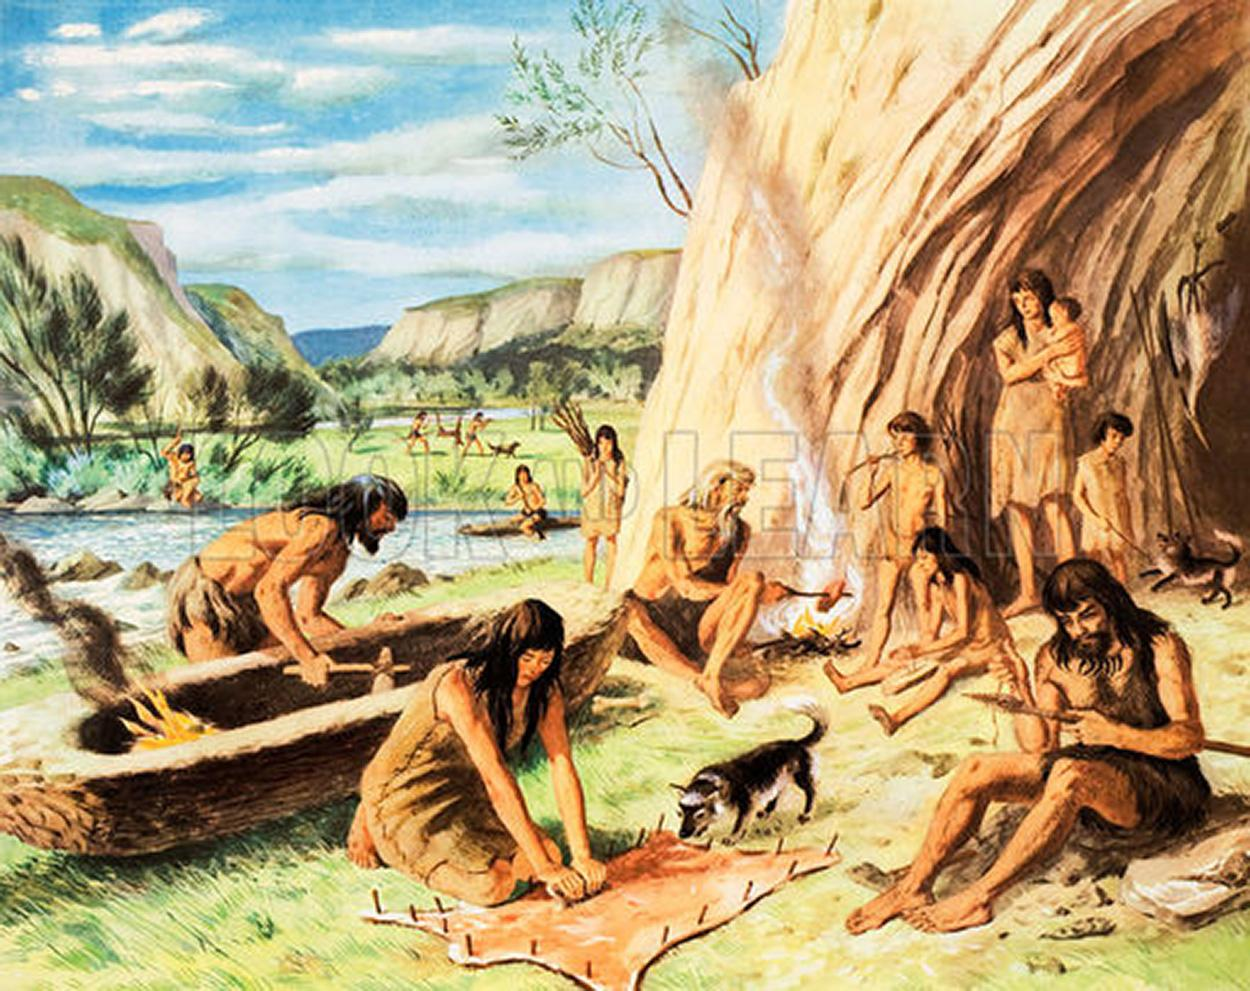 образцова, биография древние времена картинки люди сами